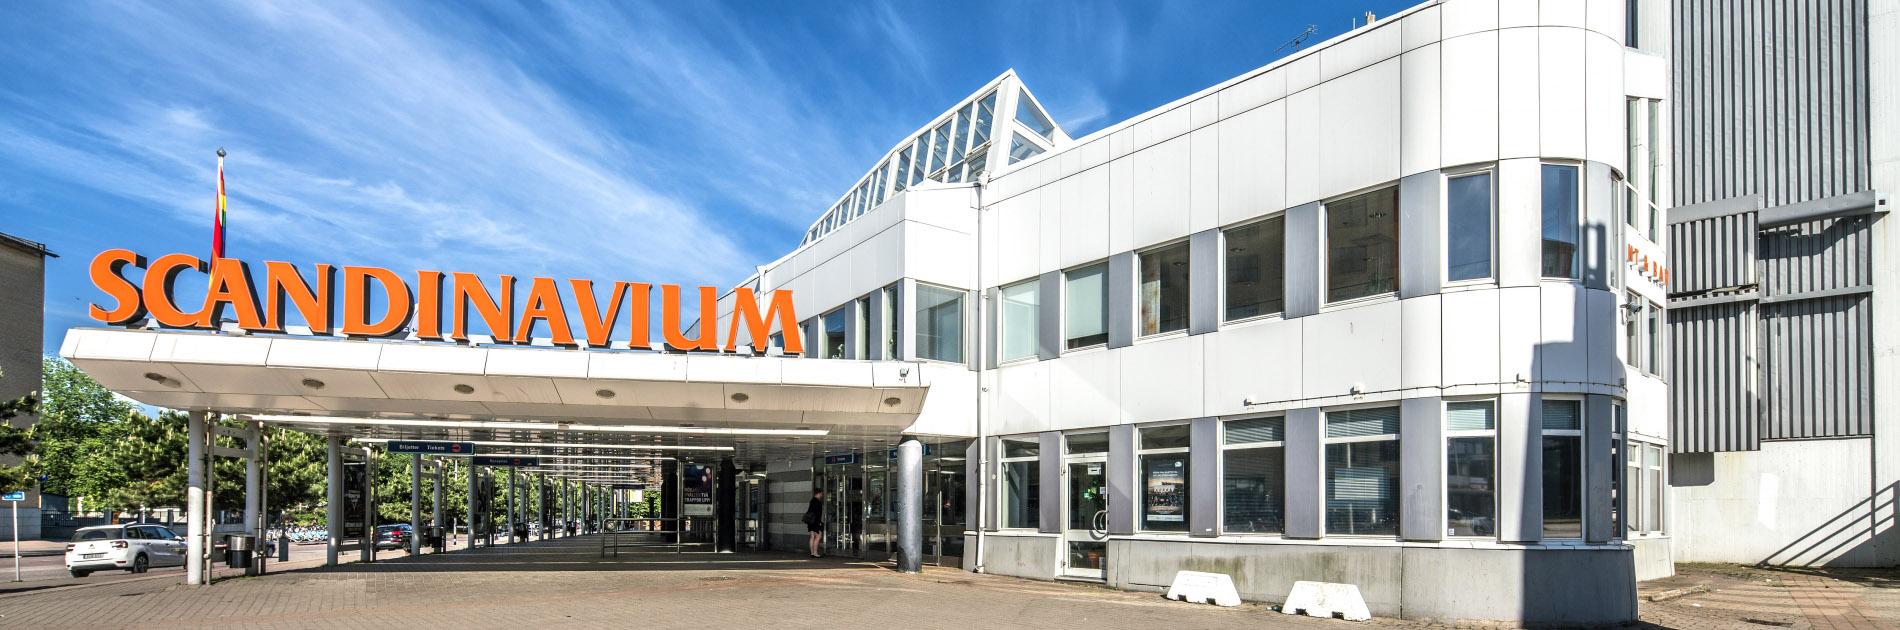 Scandinavium 2016-04.exterirexterirt